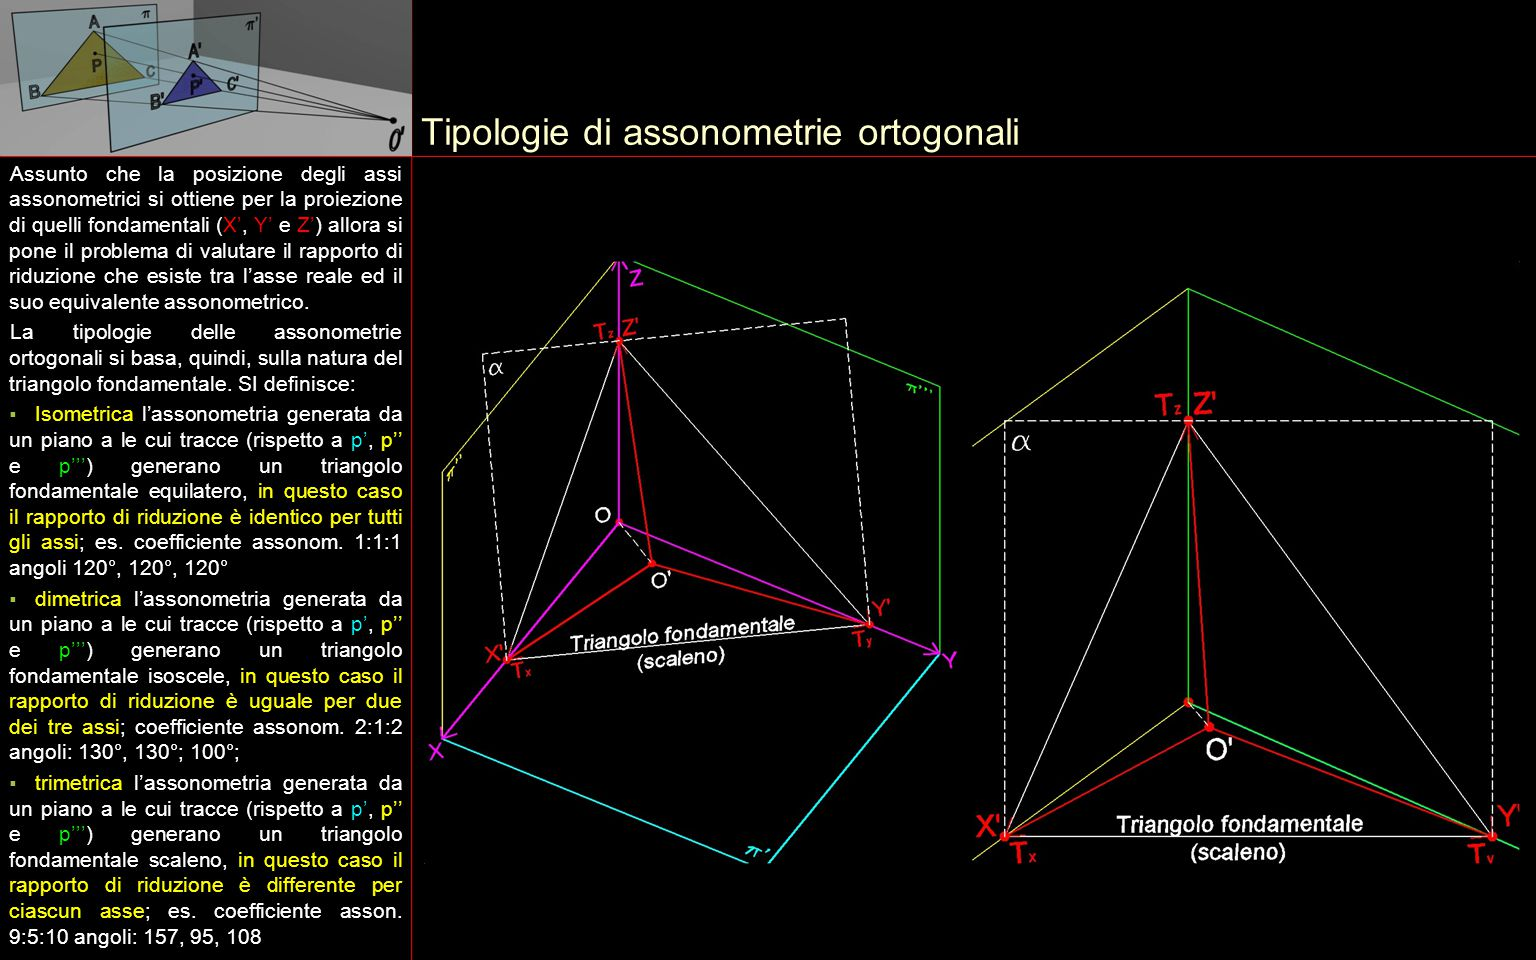 Tipologie di assonometrie ortogonali